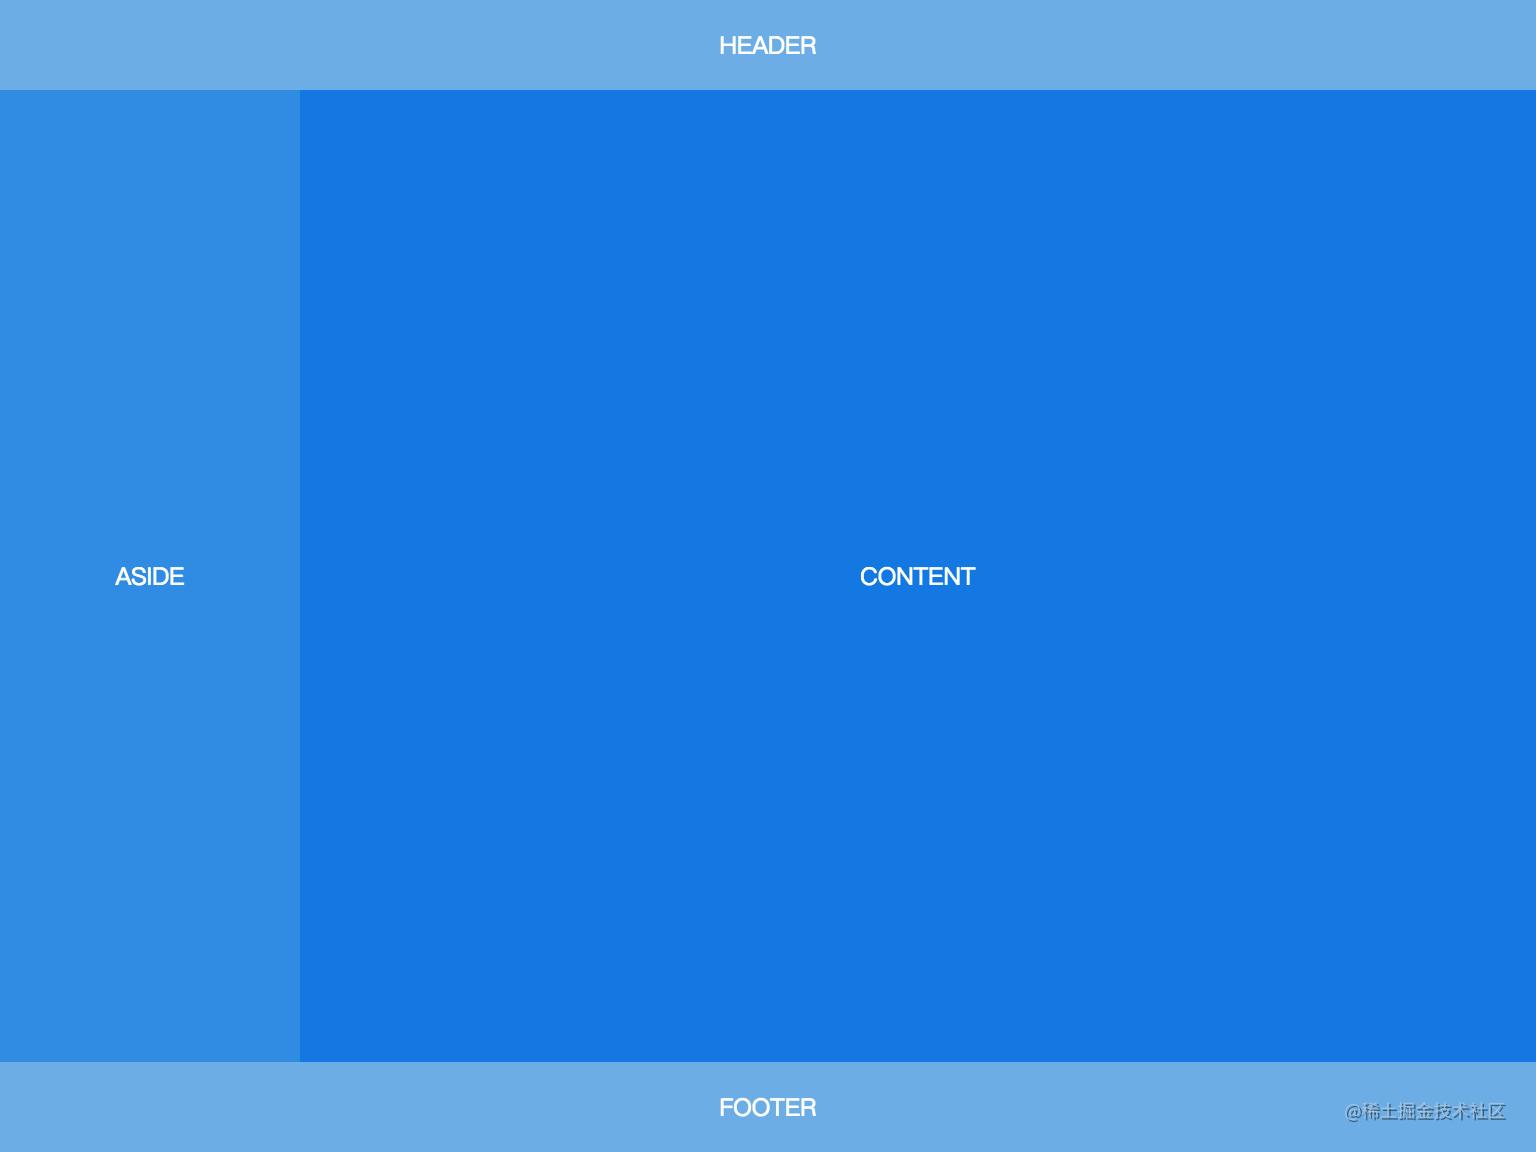 demo 2 - Fixed-Width Sidebar